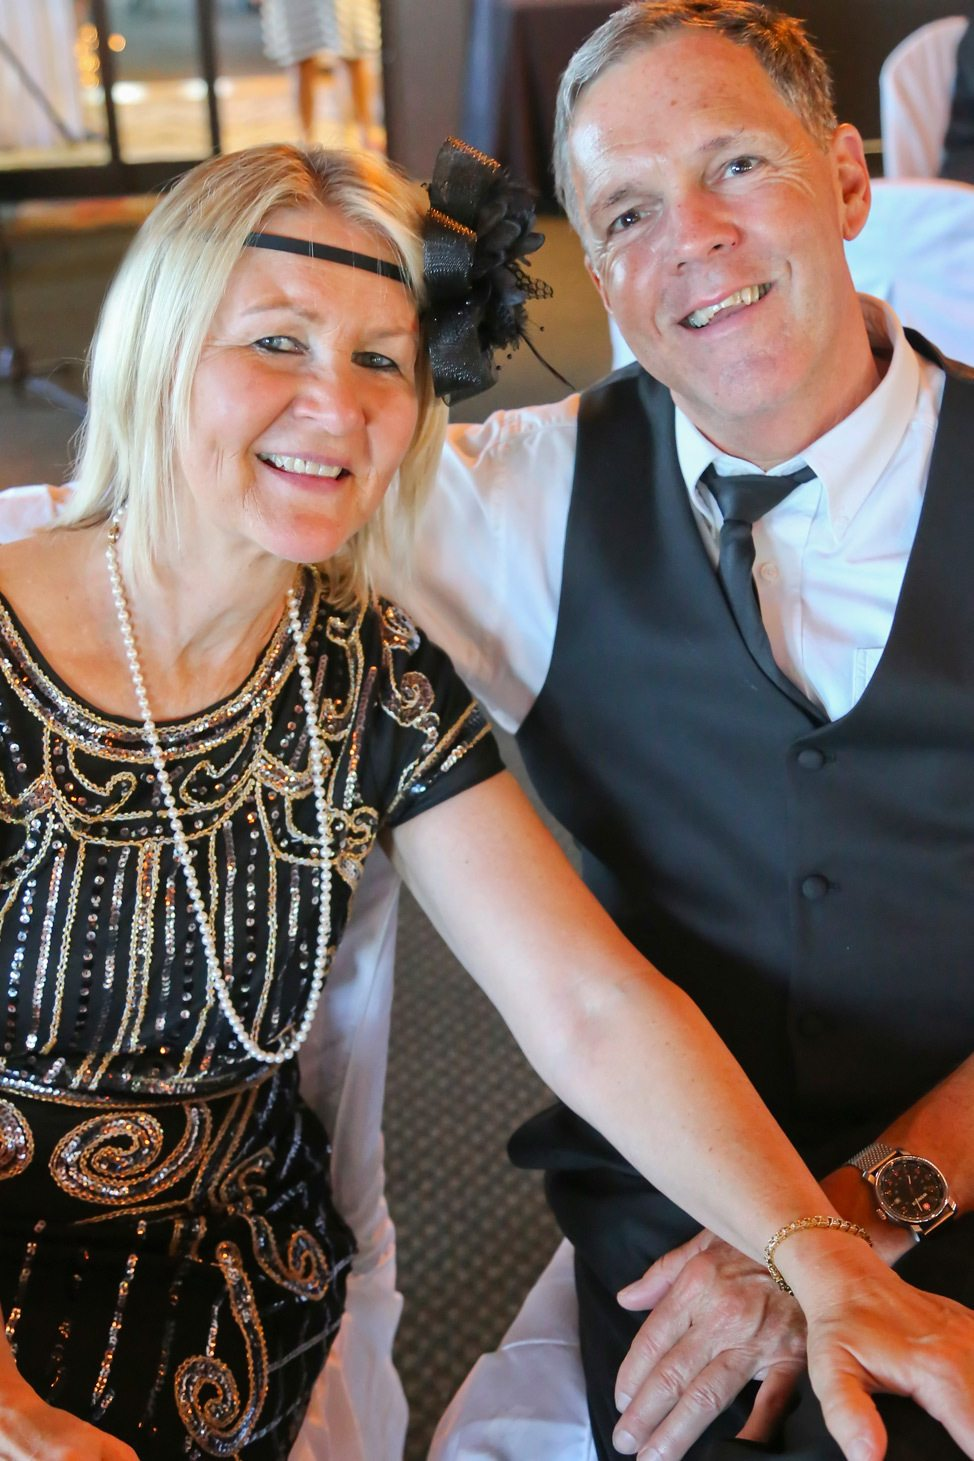 Wedding Reception at The Beach House, Decatur, Illinois